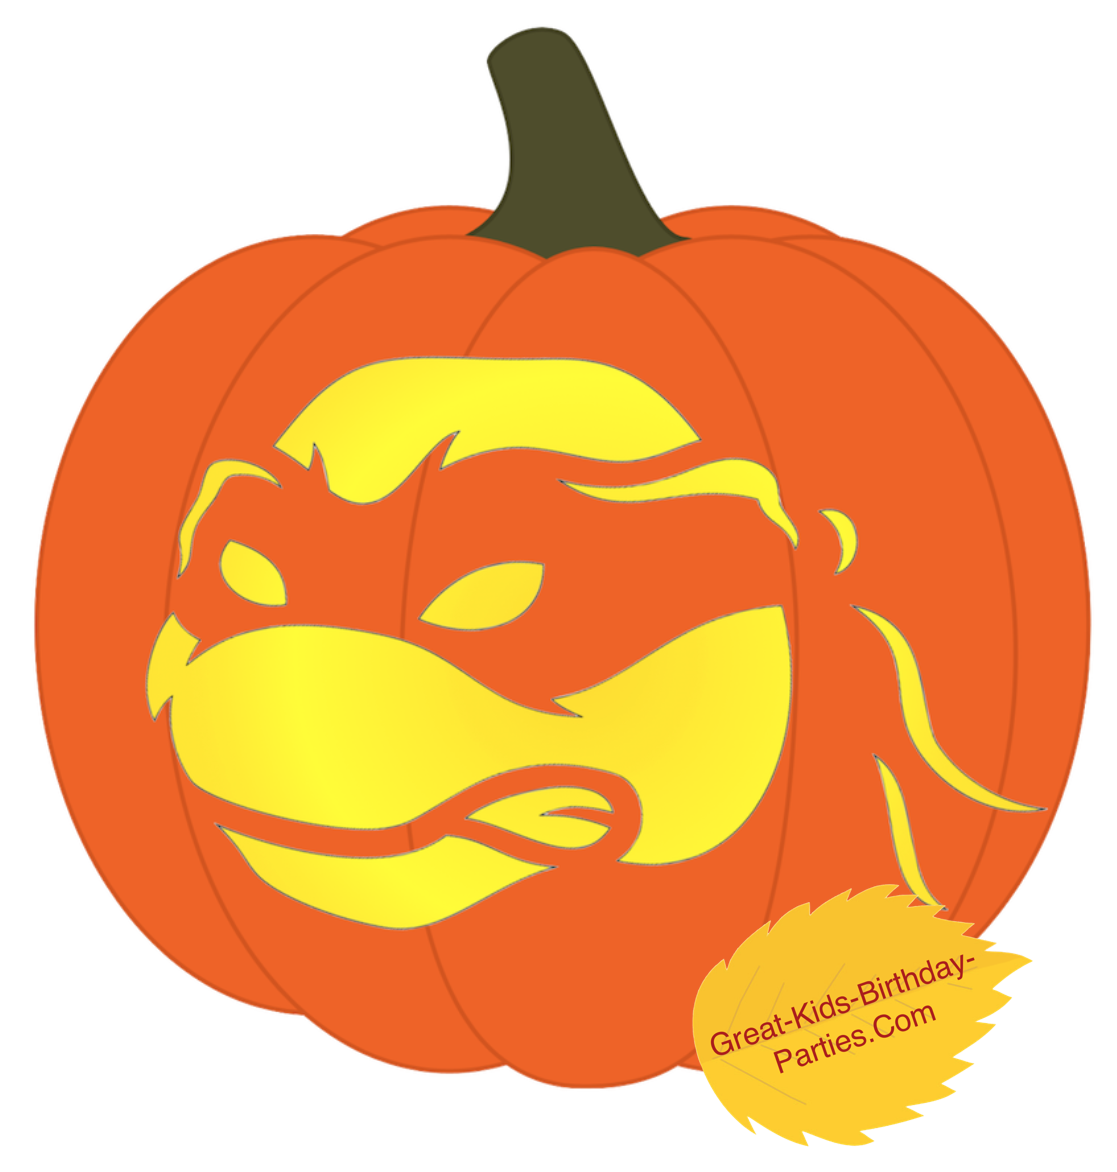 Shopkins pumpkin clipart jpg freeuse library Pumpkin Stencils jpg freeuse library